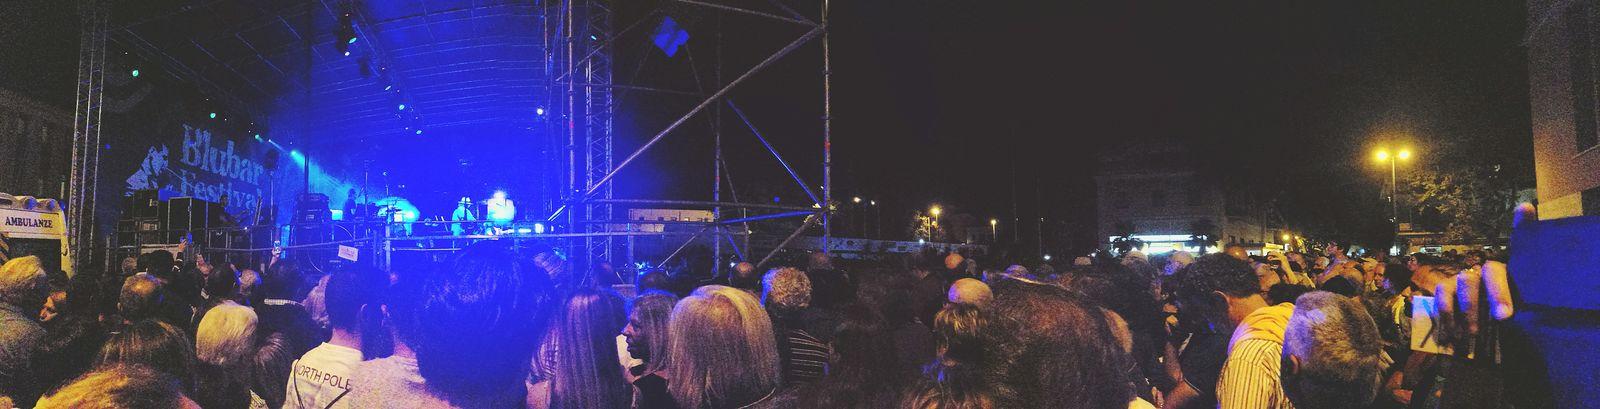 Festival Season Degregori Francescodegregori Blubar Francavillaalmare 13agosto2016 2K16 ✌️ Piazzasirena Music Ladonnacannone Buonanottefiorellino